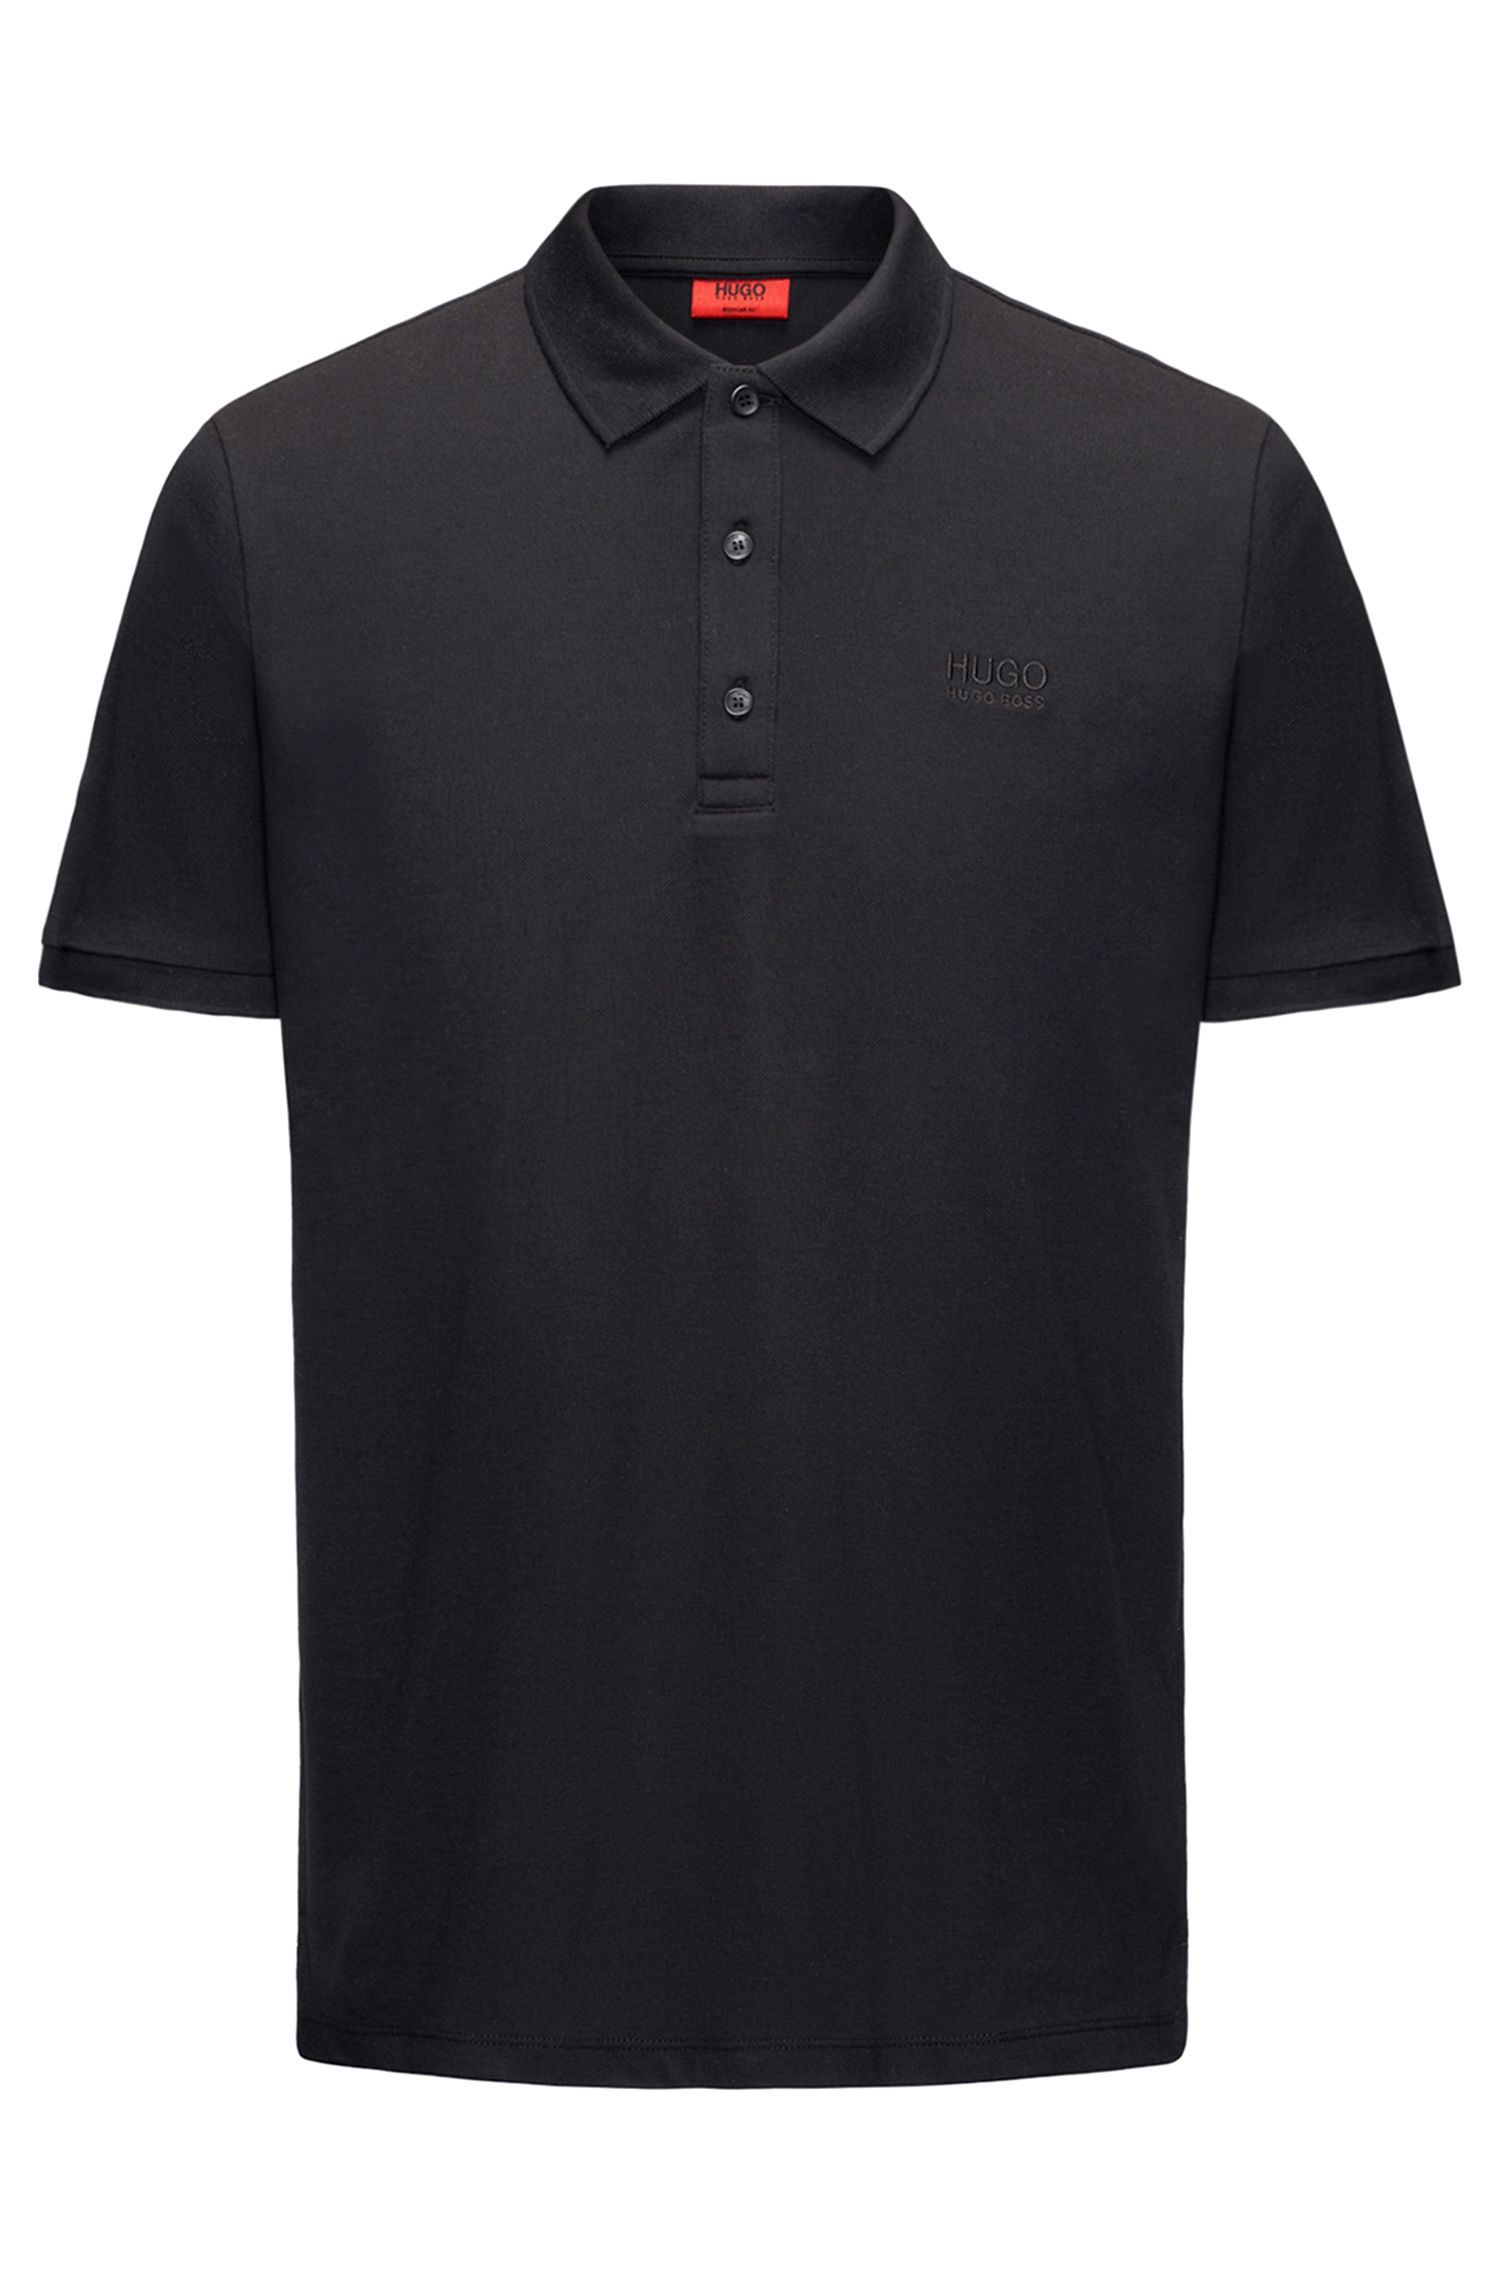 Regular-Fit Poloshirt aus softer Baumwolle, Schwarz